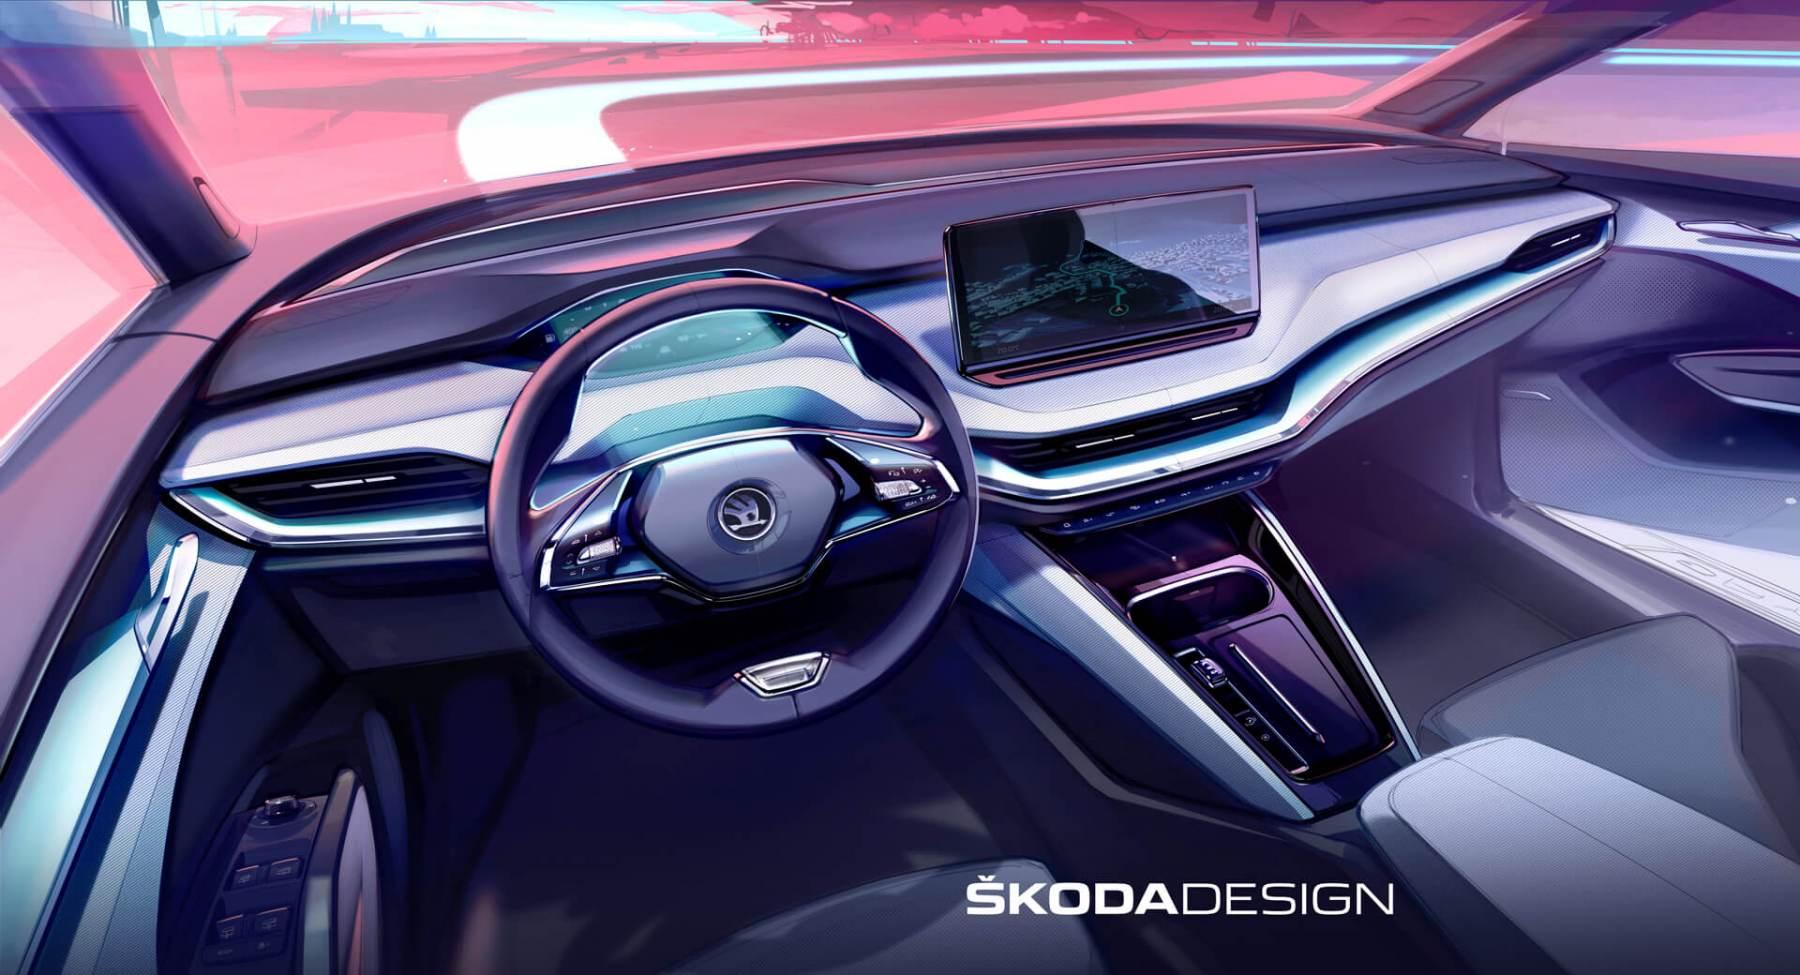 Skoda Enyaq iV - Teaser